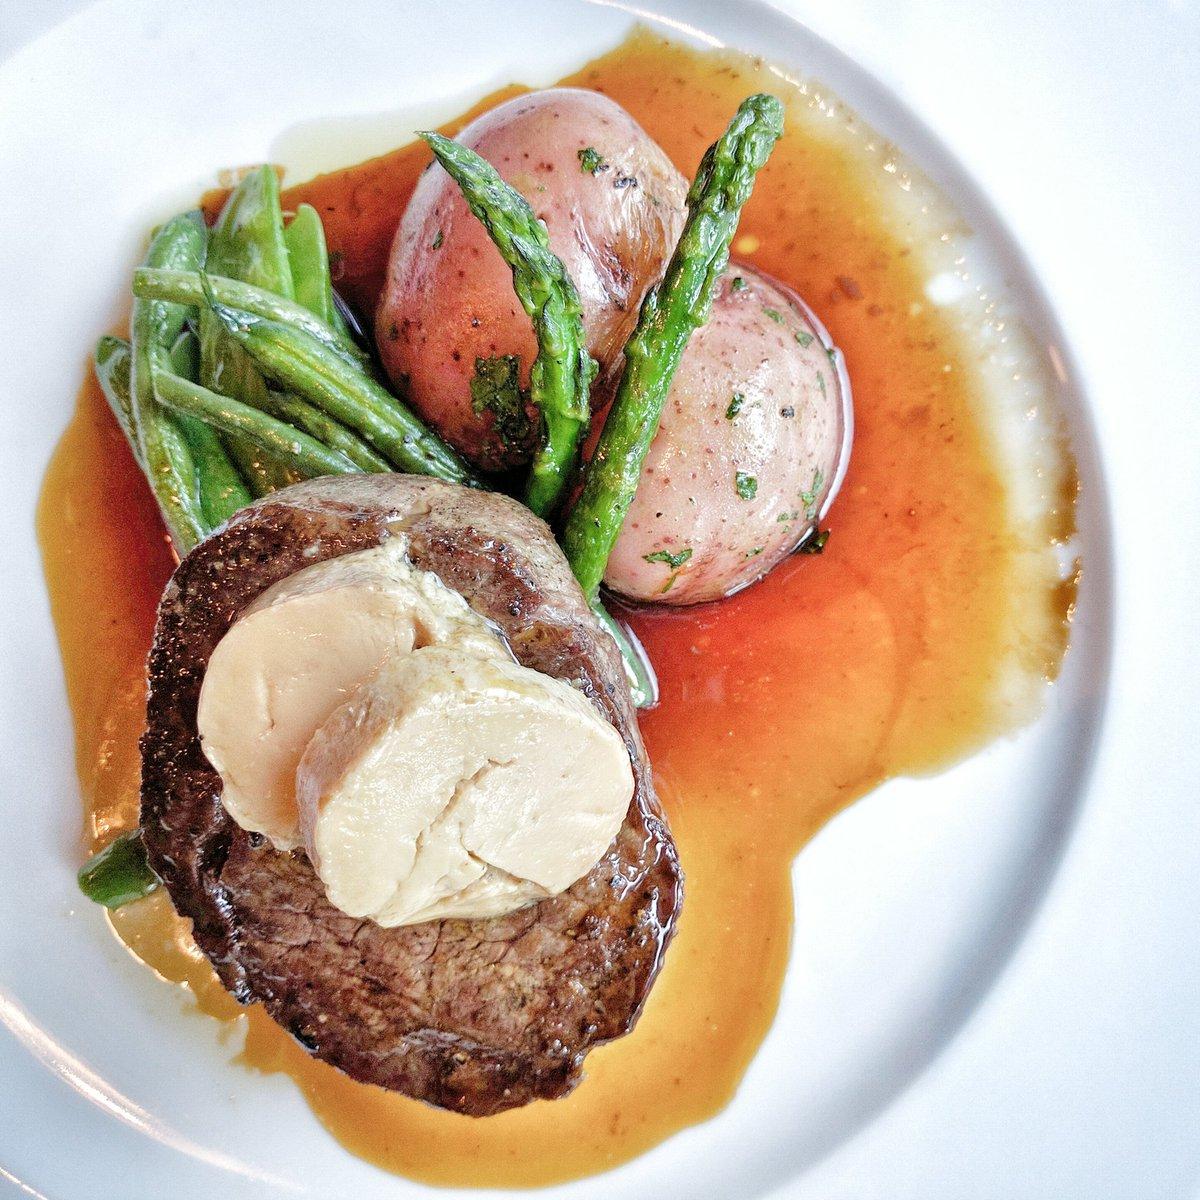 Travelling Foodie Eats Beef Tenderloin Meddalion at Paese Ristorante Toronto